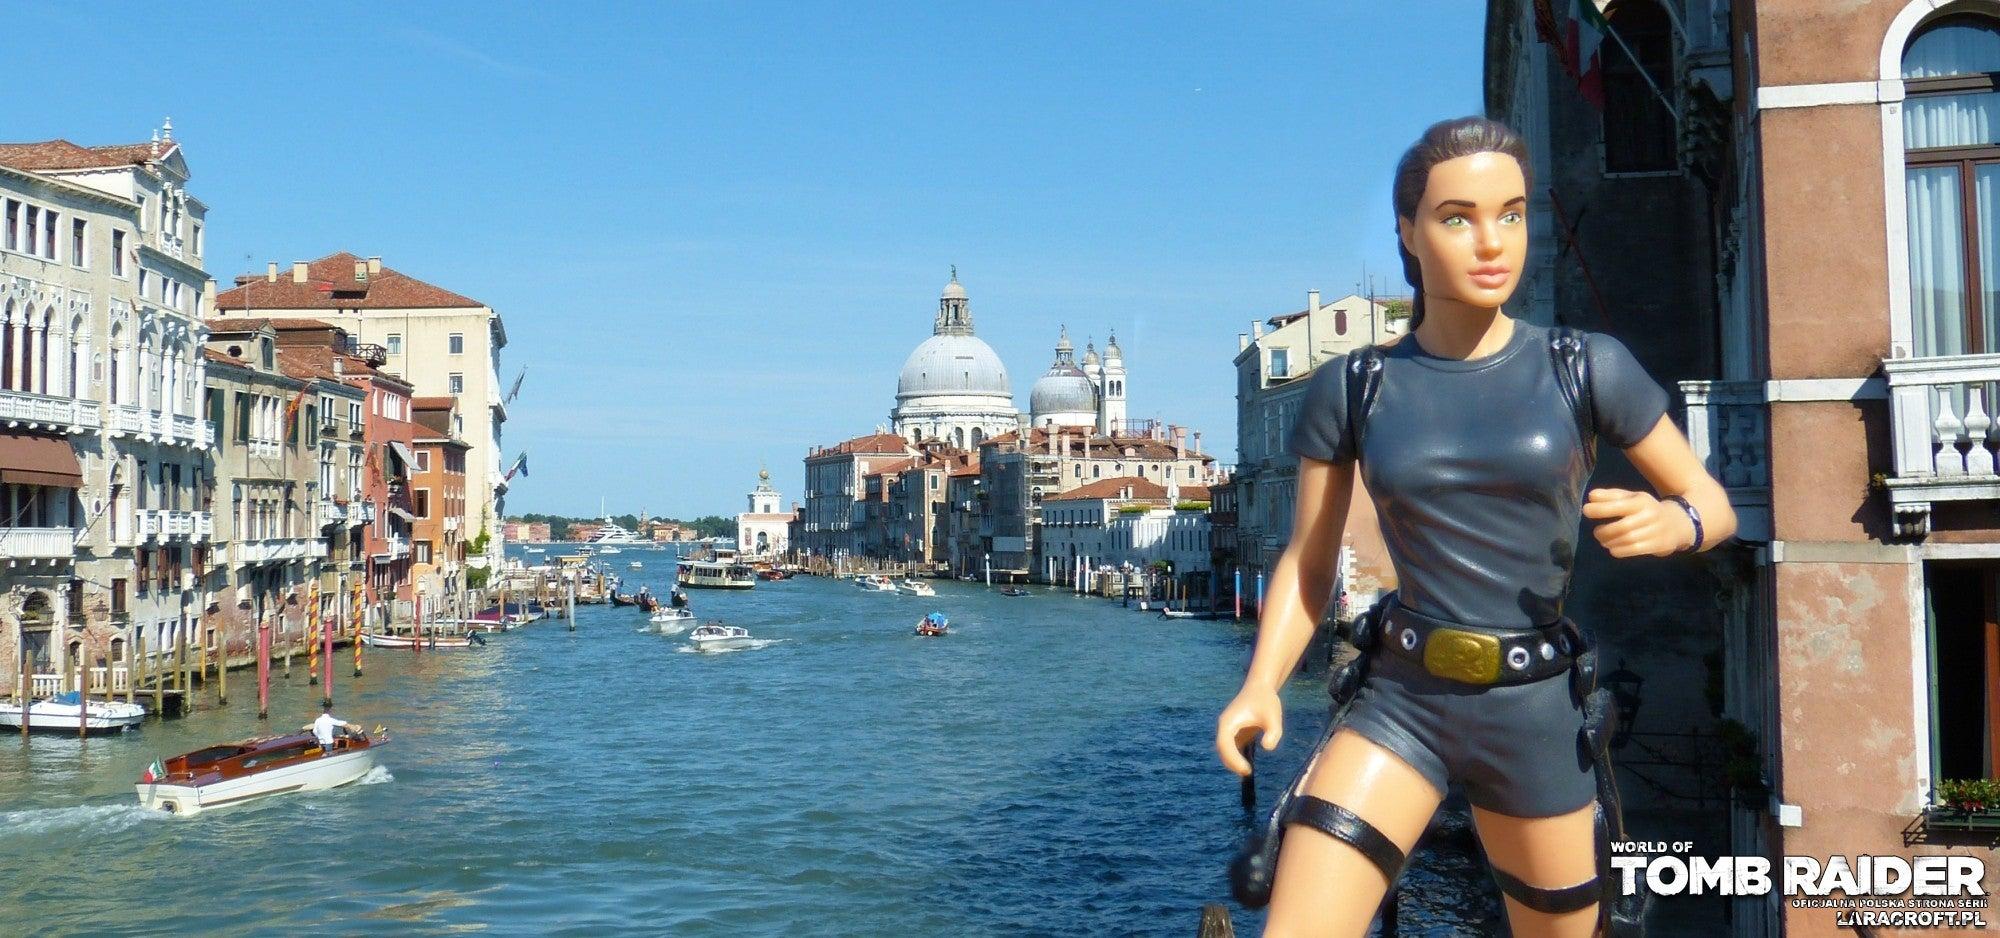 A photograph of an Angelina Jolie Lara Croft figure in Venice